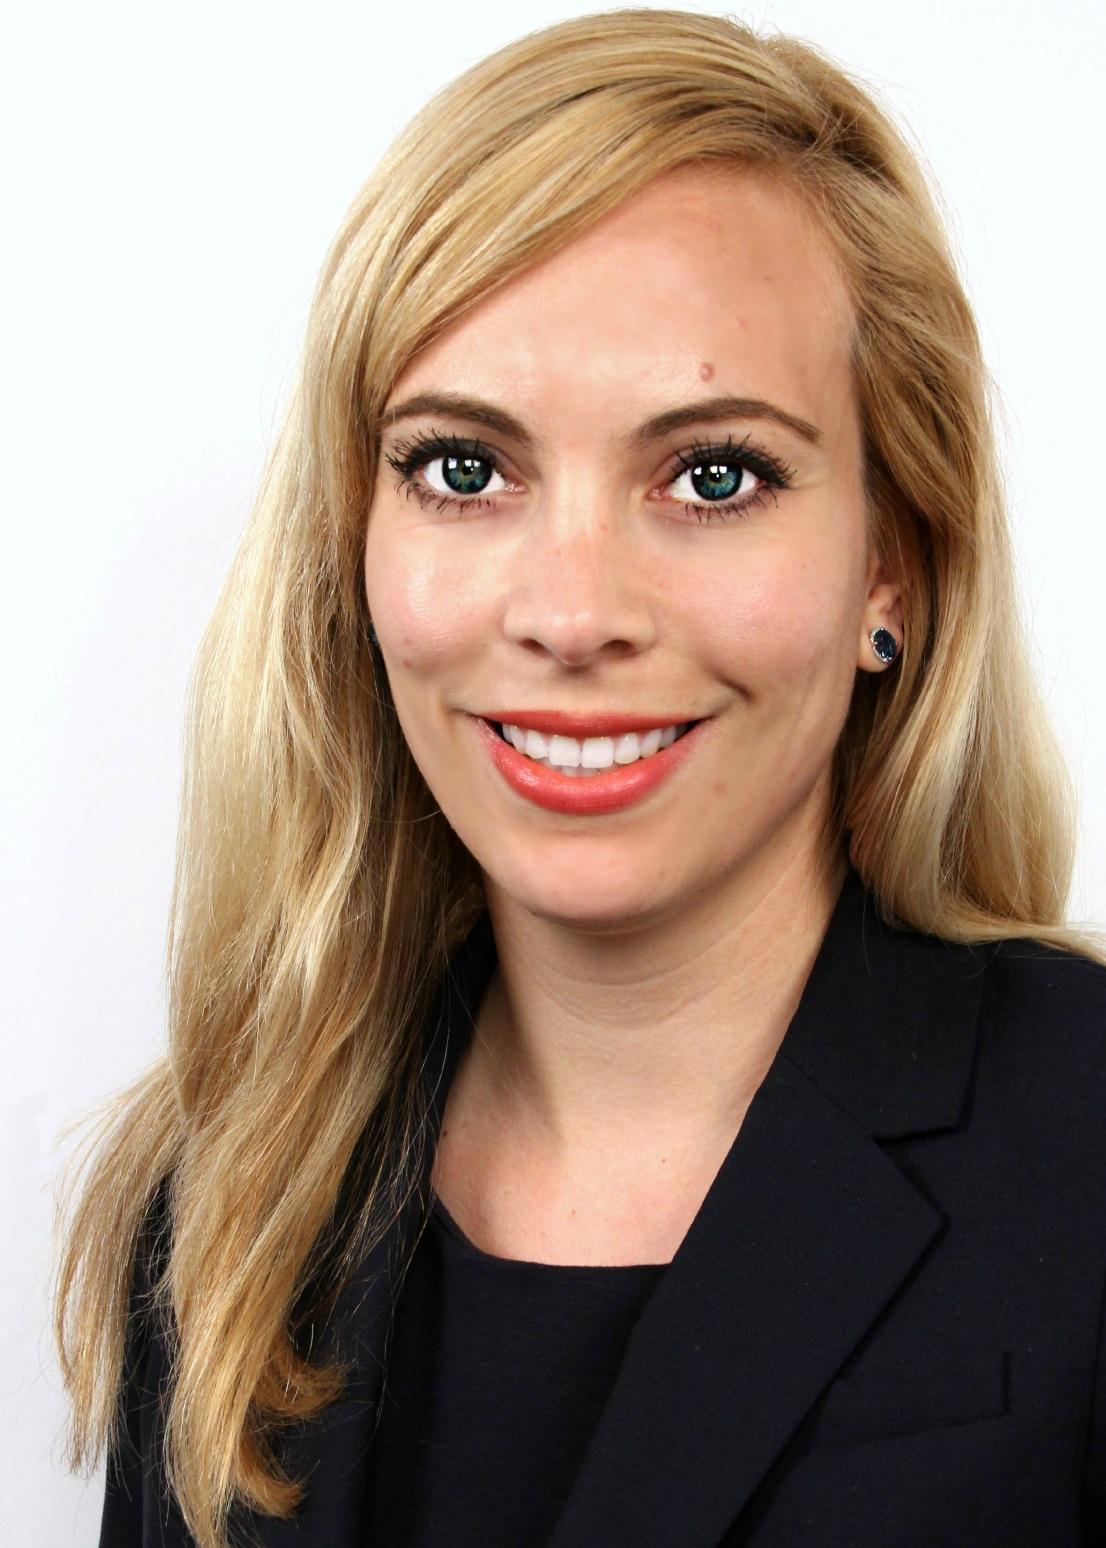 JenniferRodriguez